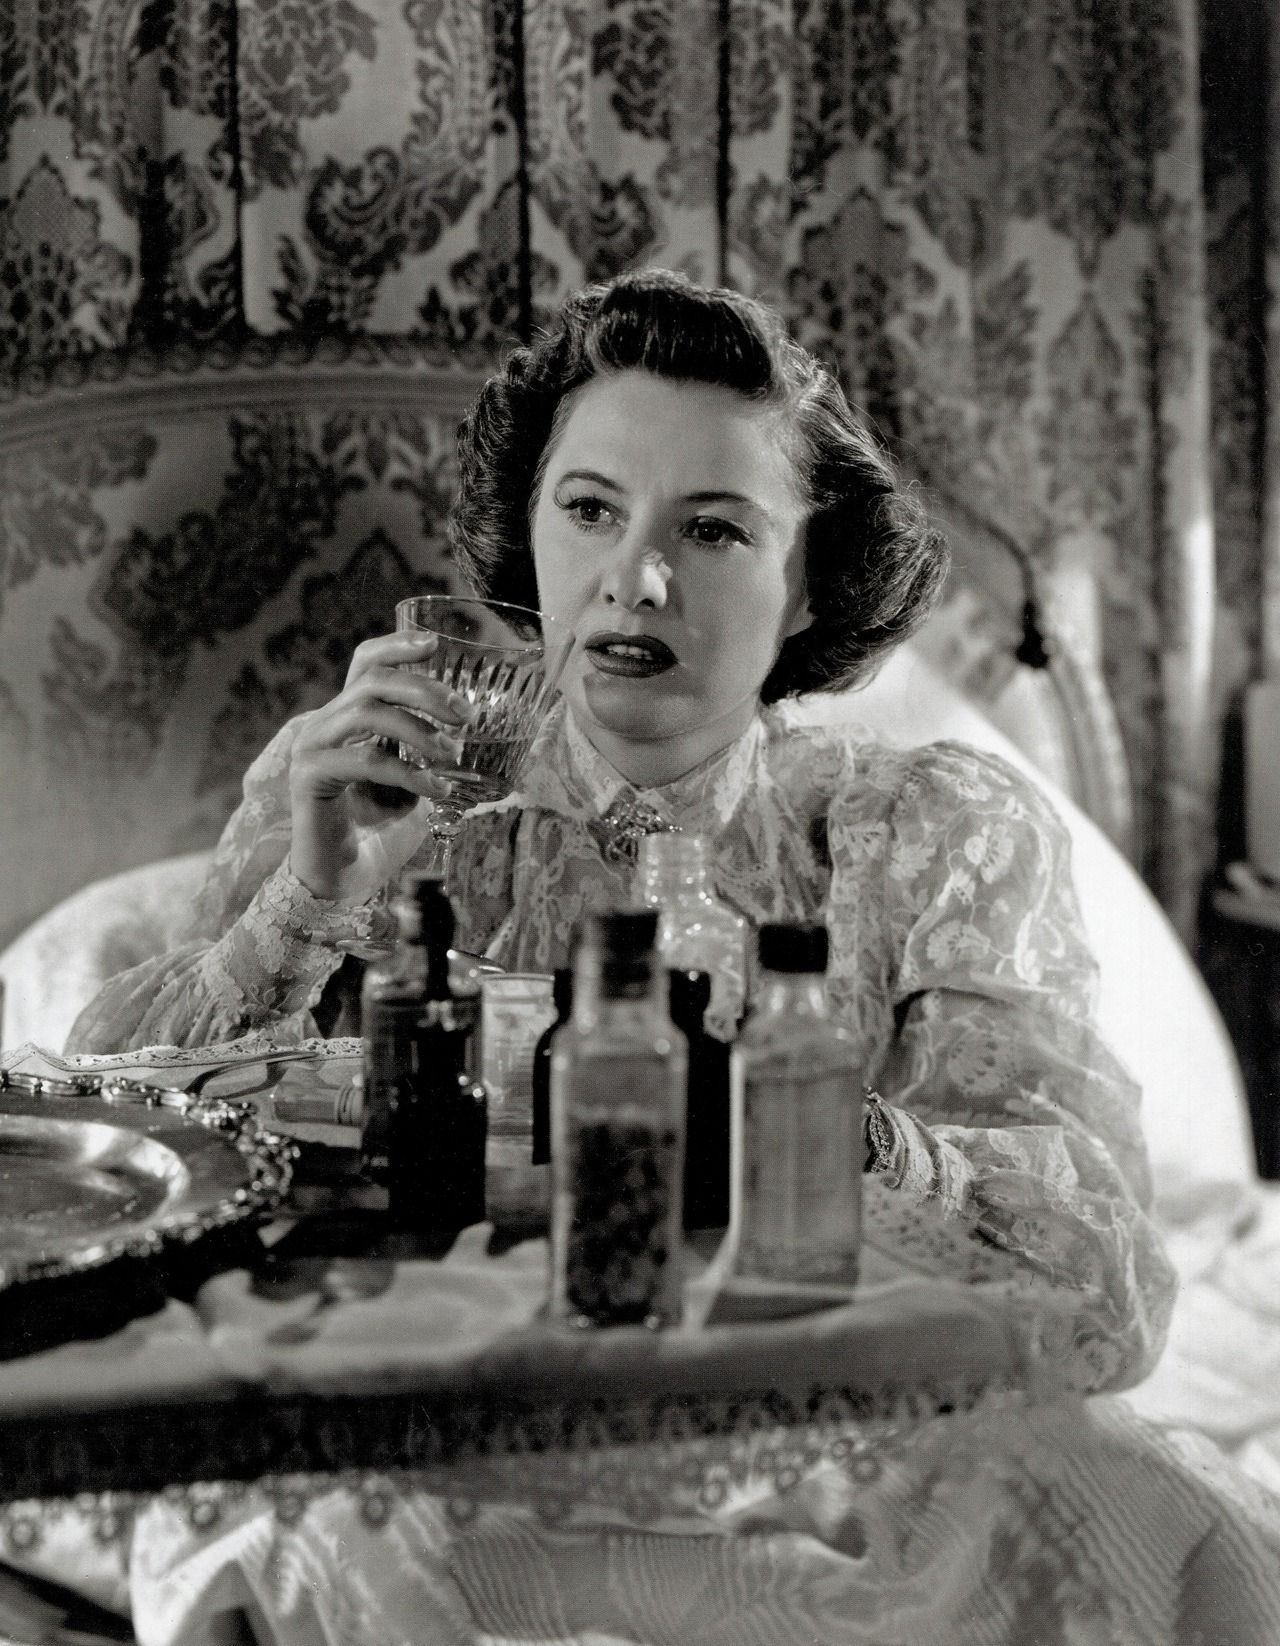 Barbara Stanwyck dieulois